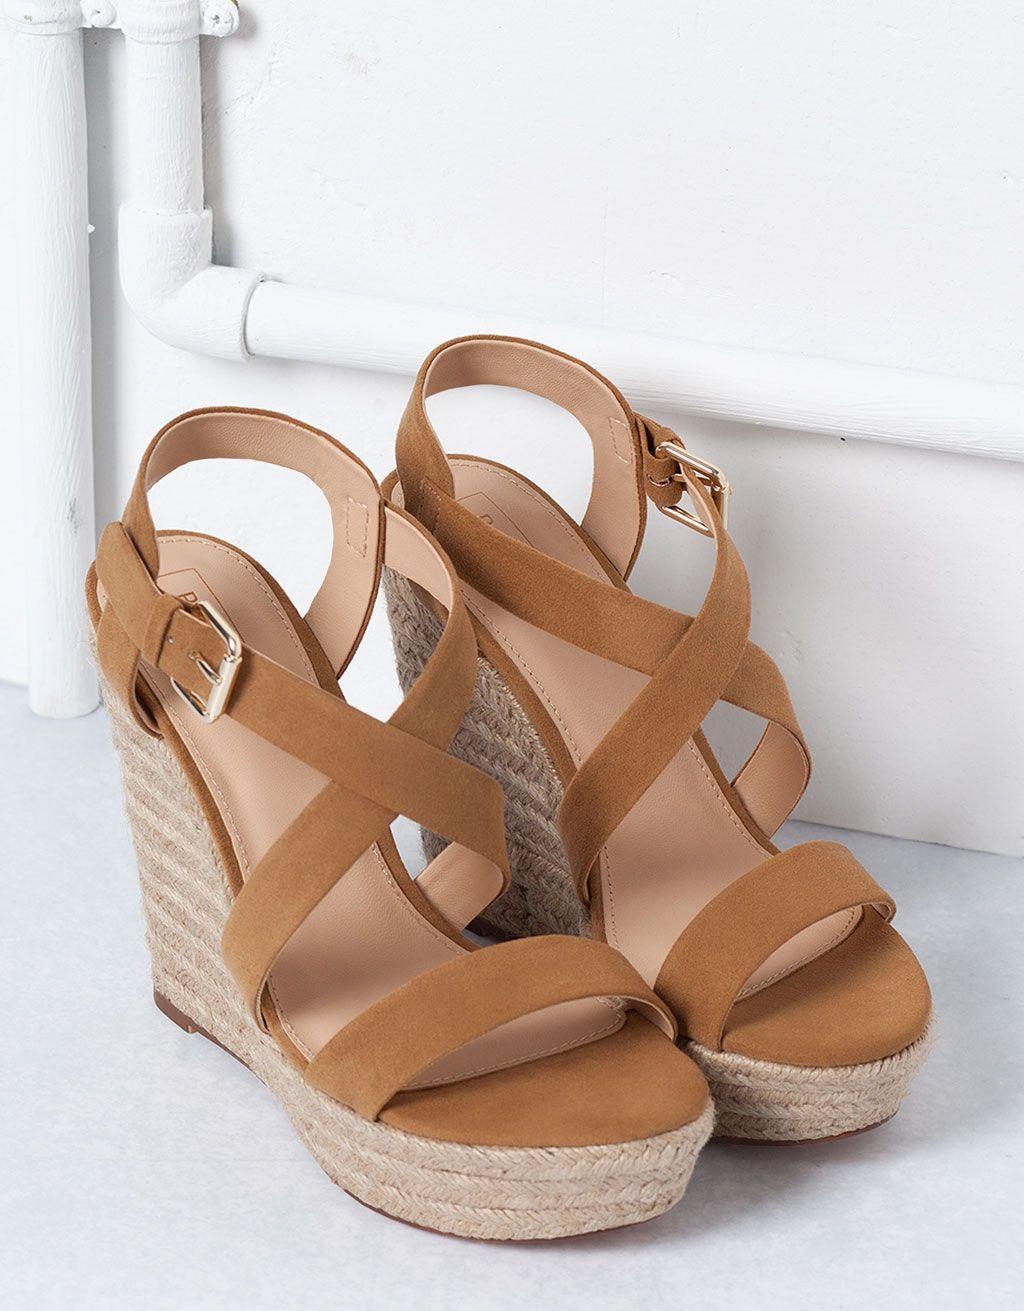 89a36a9b6b27 http   www.bershka.com es es chica bershka zapatos-c1368712p5331023.html